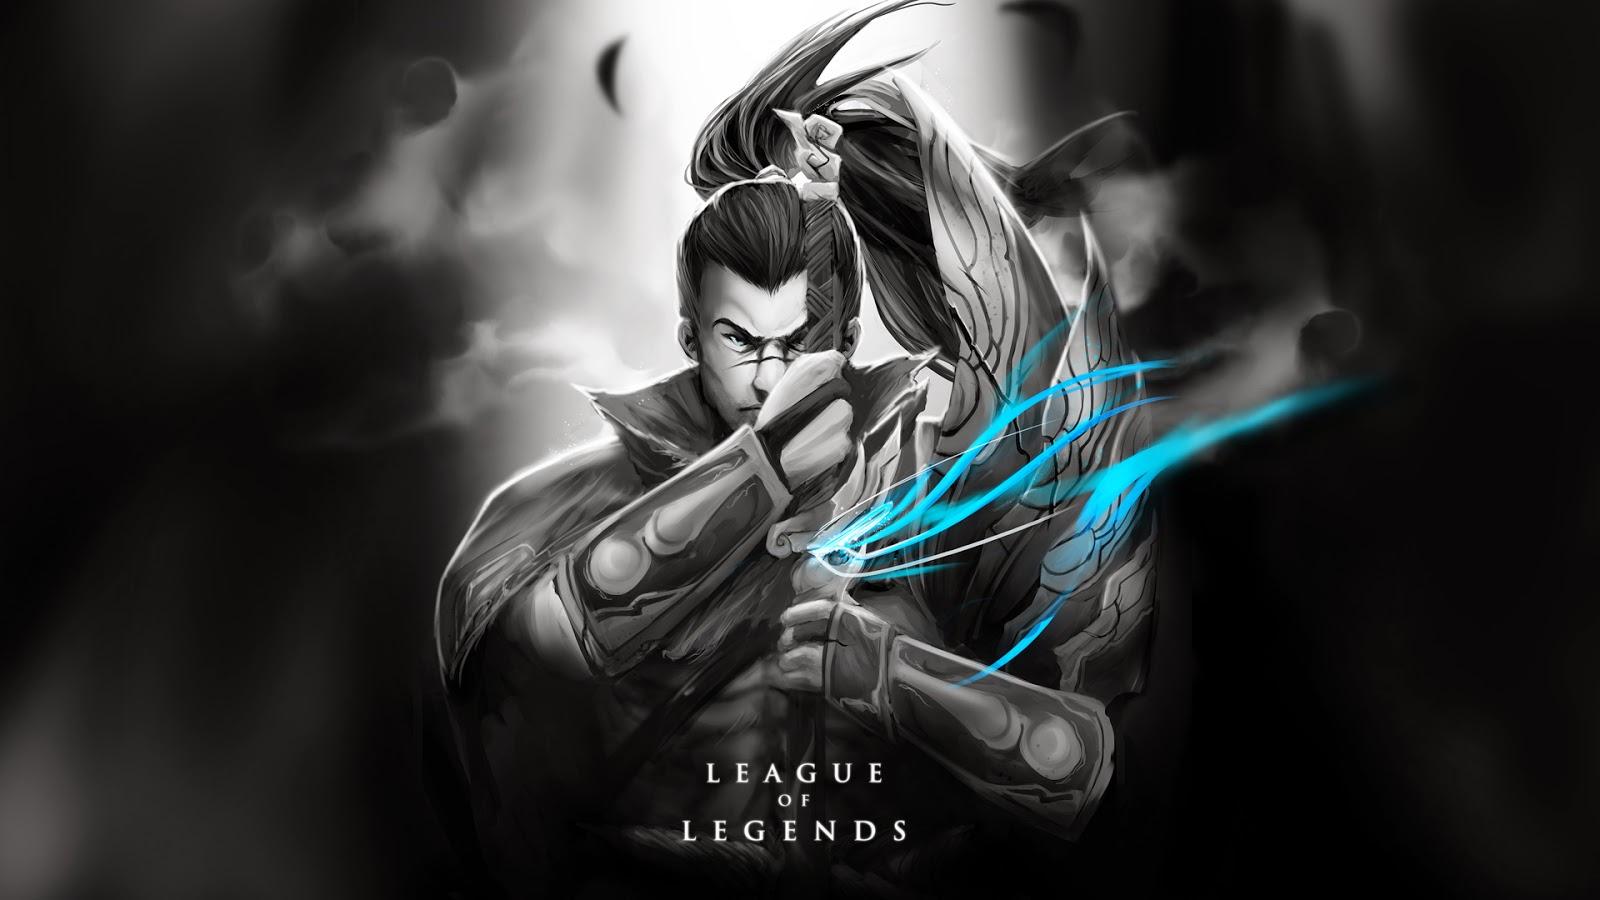 Lol Wallpapers: Yasuo League Of Legends Wallpaper, Yasuo Desktop Wallpaper